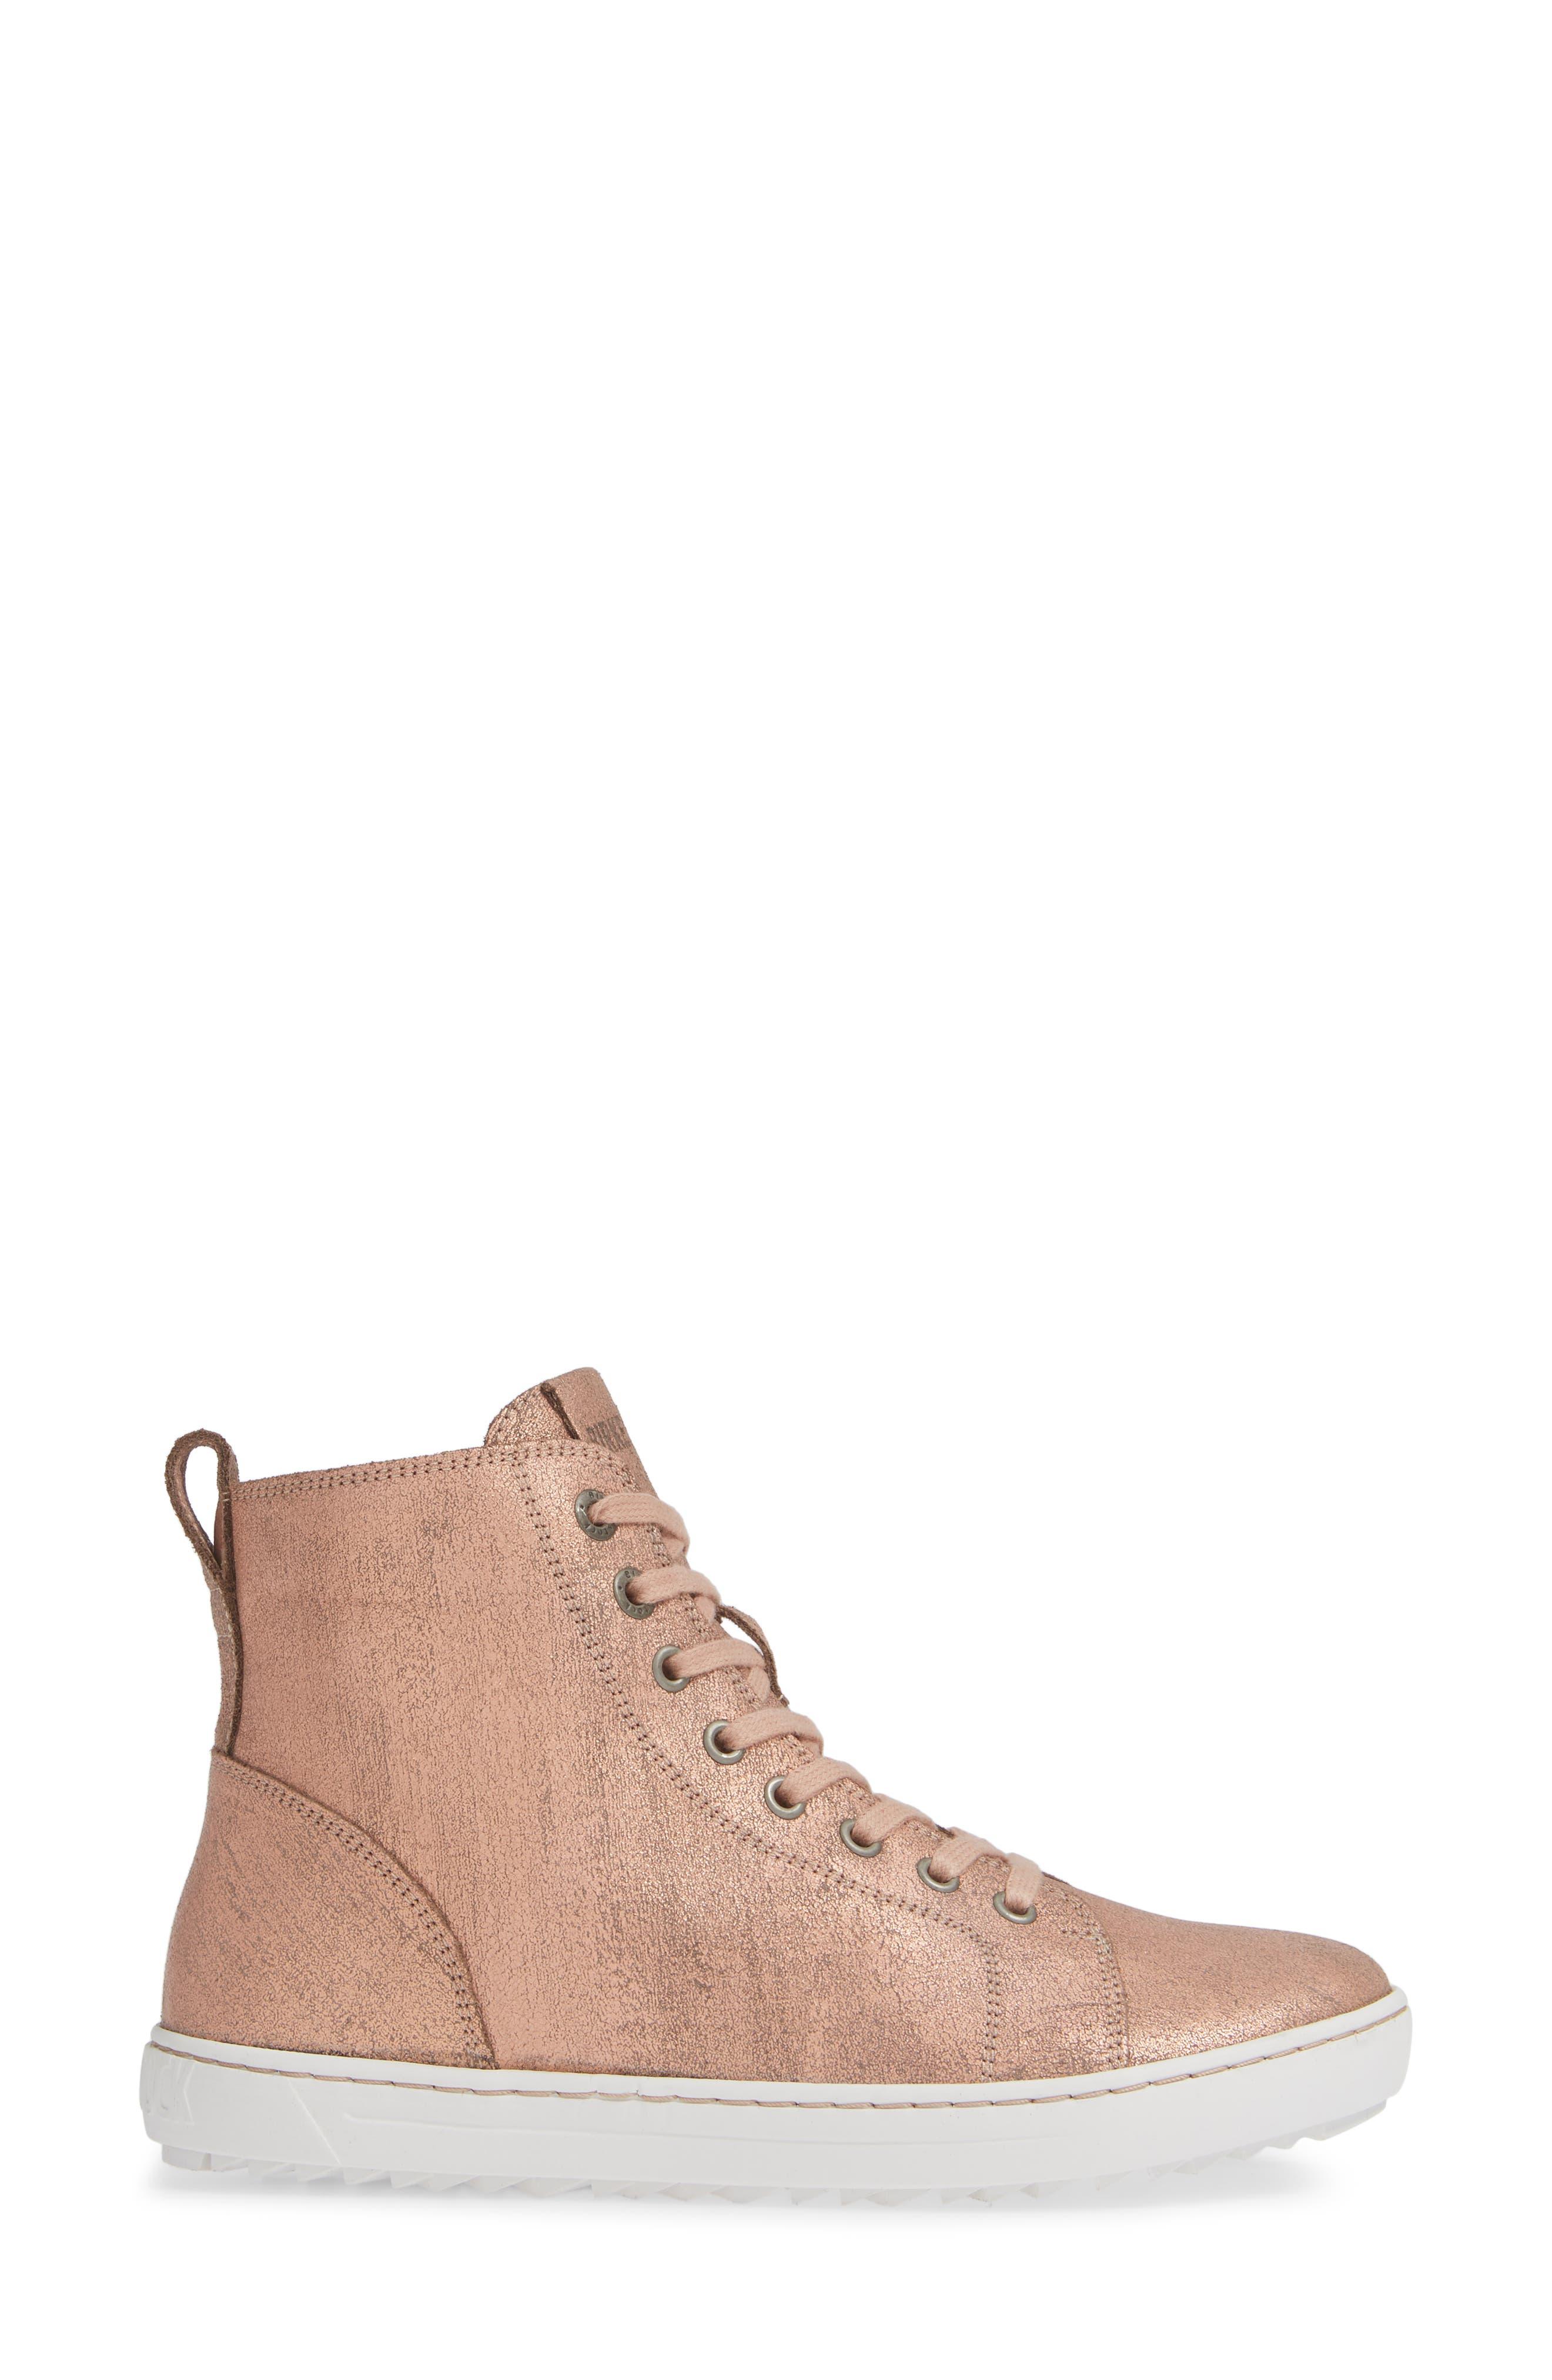 Bartlett High Top Sneaker,                             Alternate thumbnail 3, color,                             METALLIC ROSE LEATHER